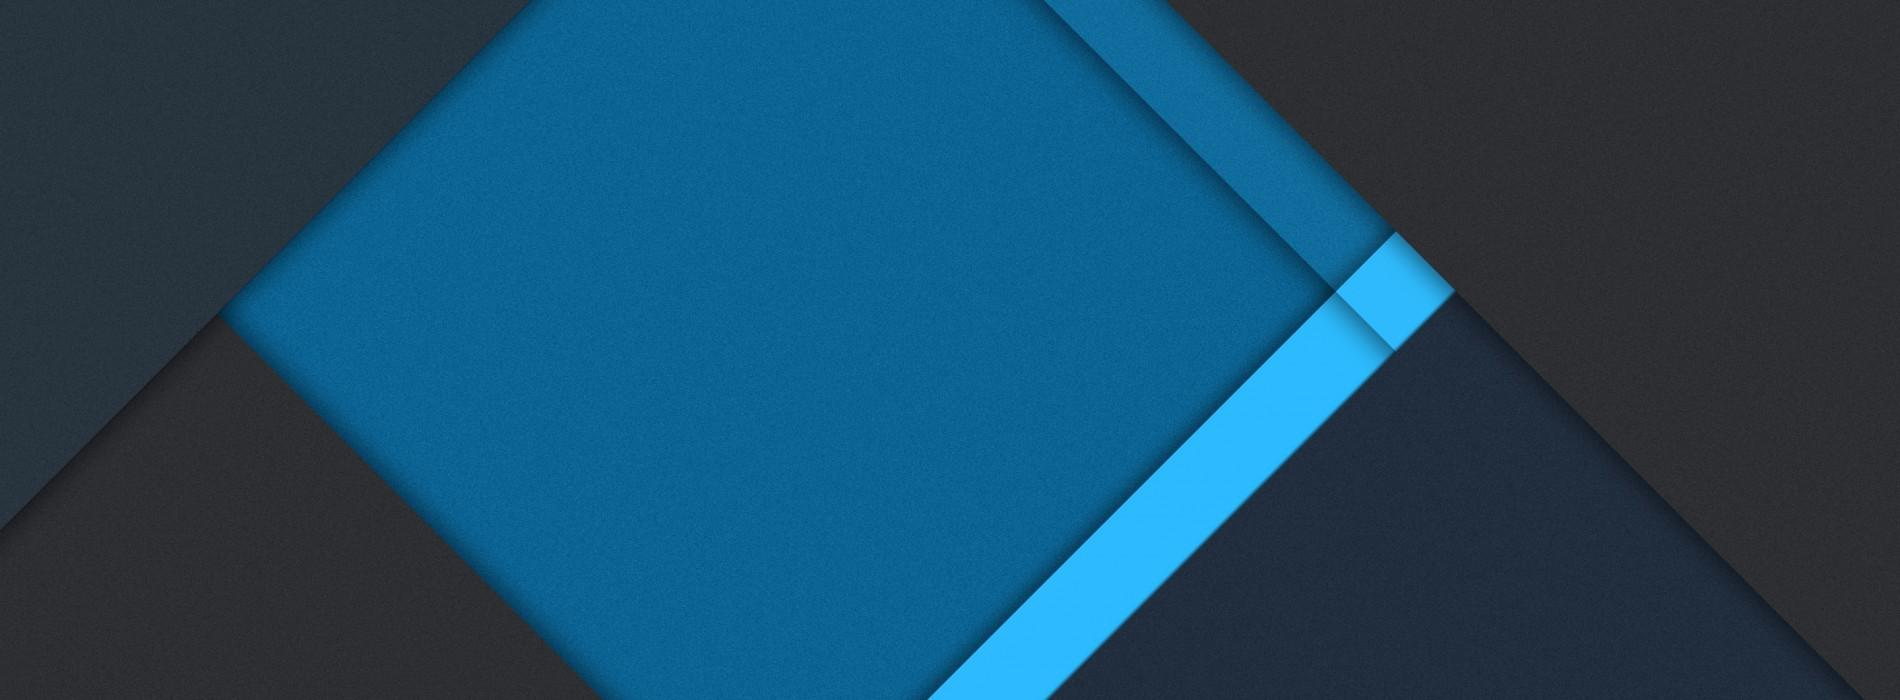 46+] BlackBerry Priv Wallpaper on WallpaperSafari